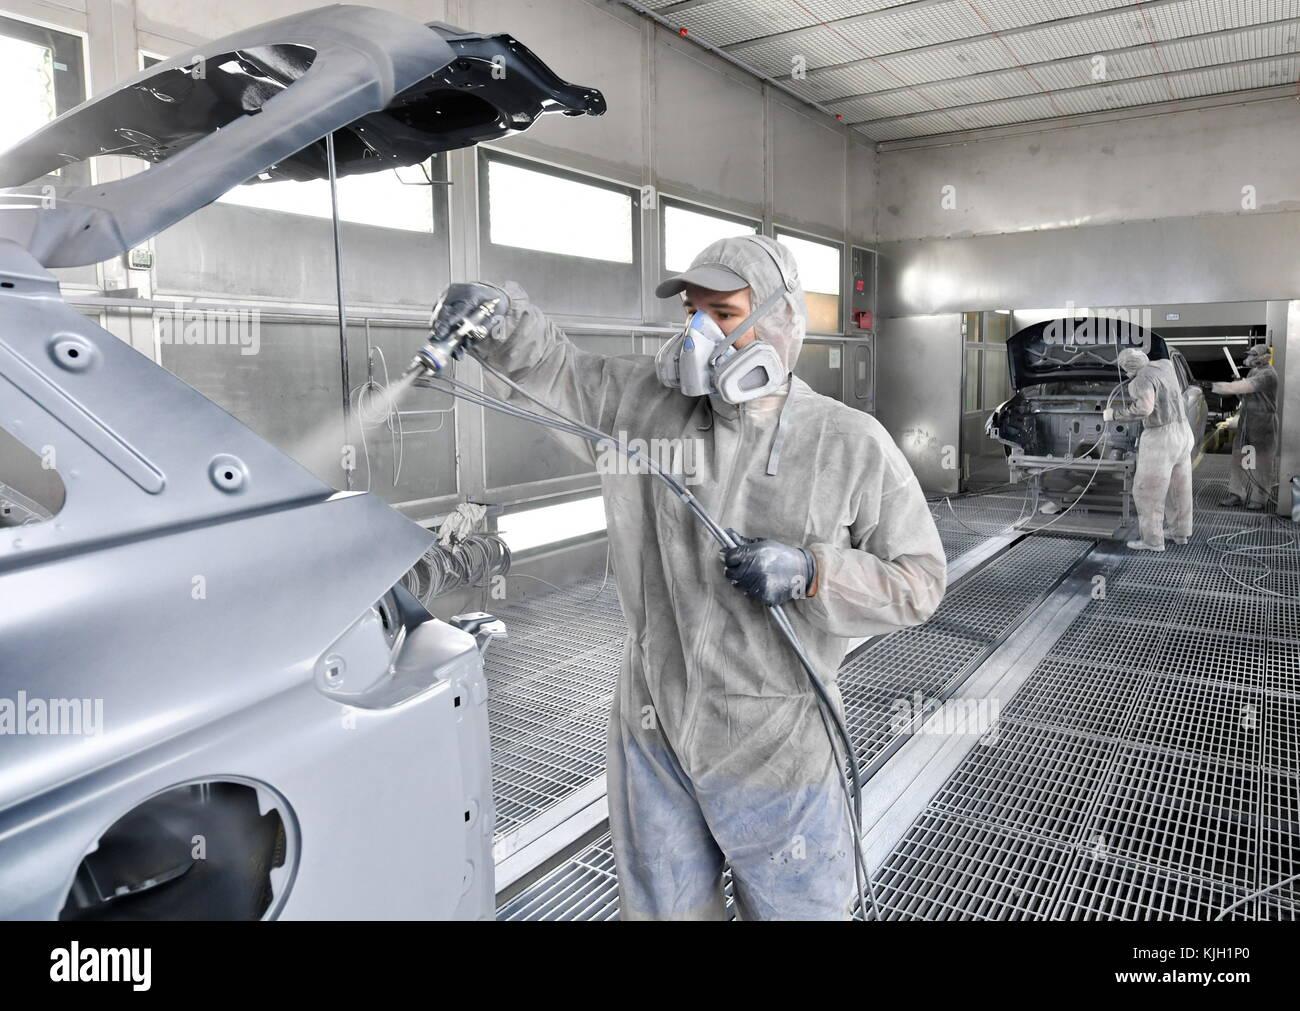 Automobile Assembly Line China Stockfotos & Automobile Assembly Line ...